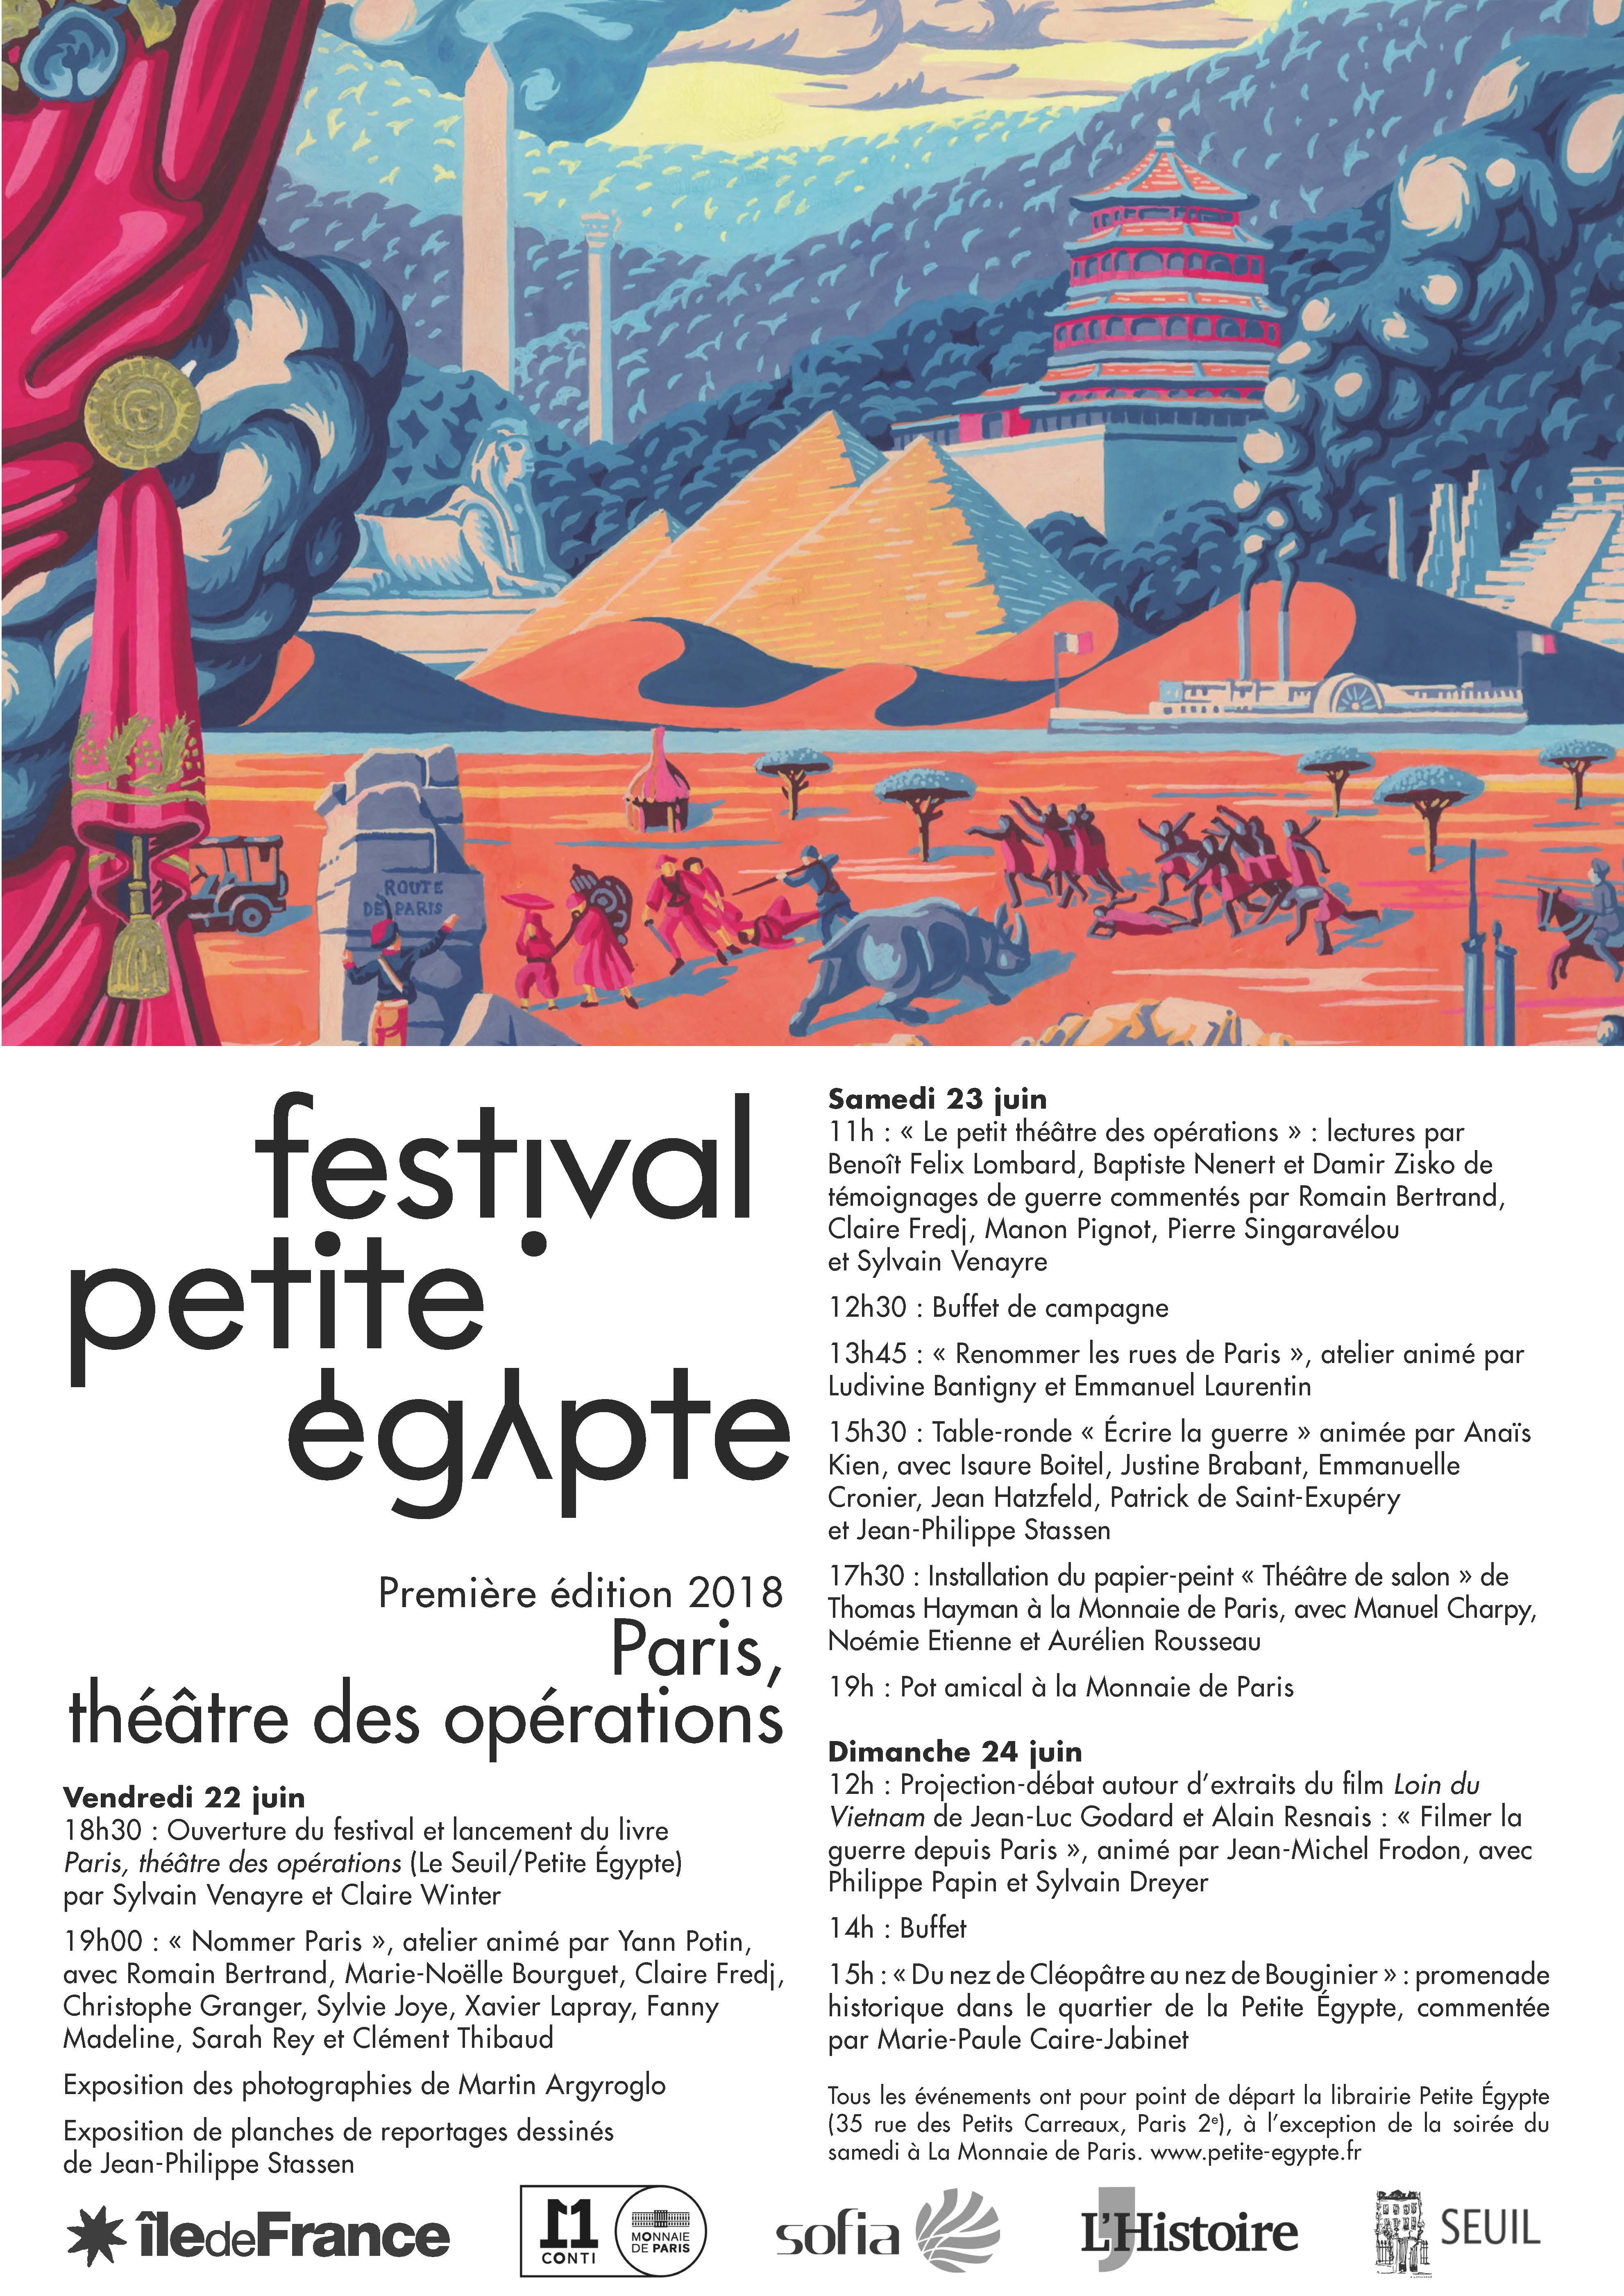 Festival petite Egypte